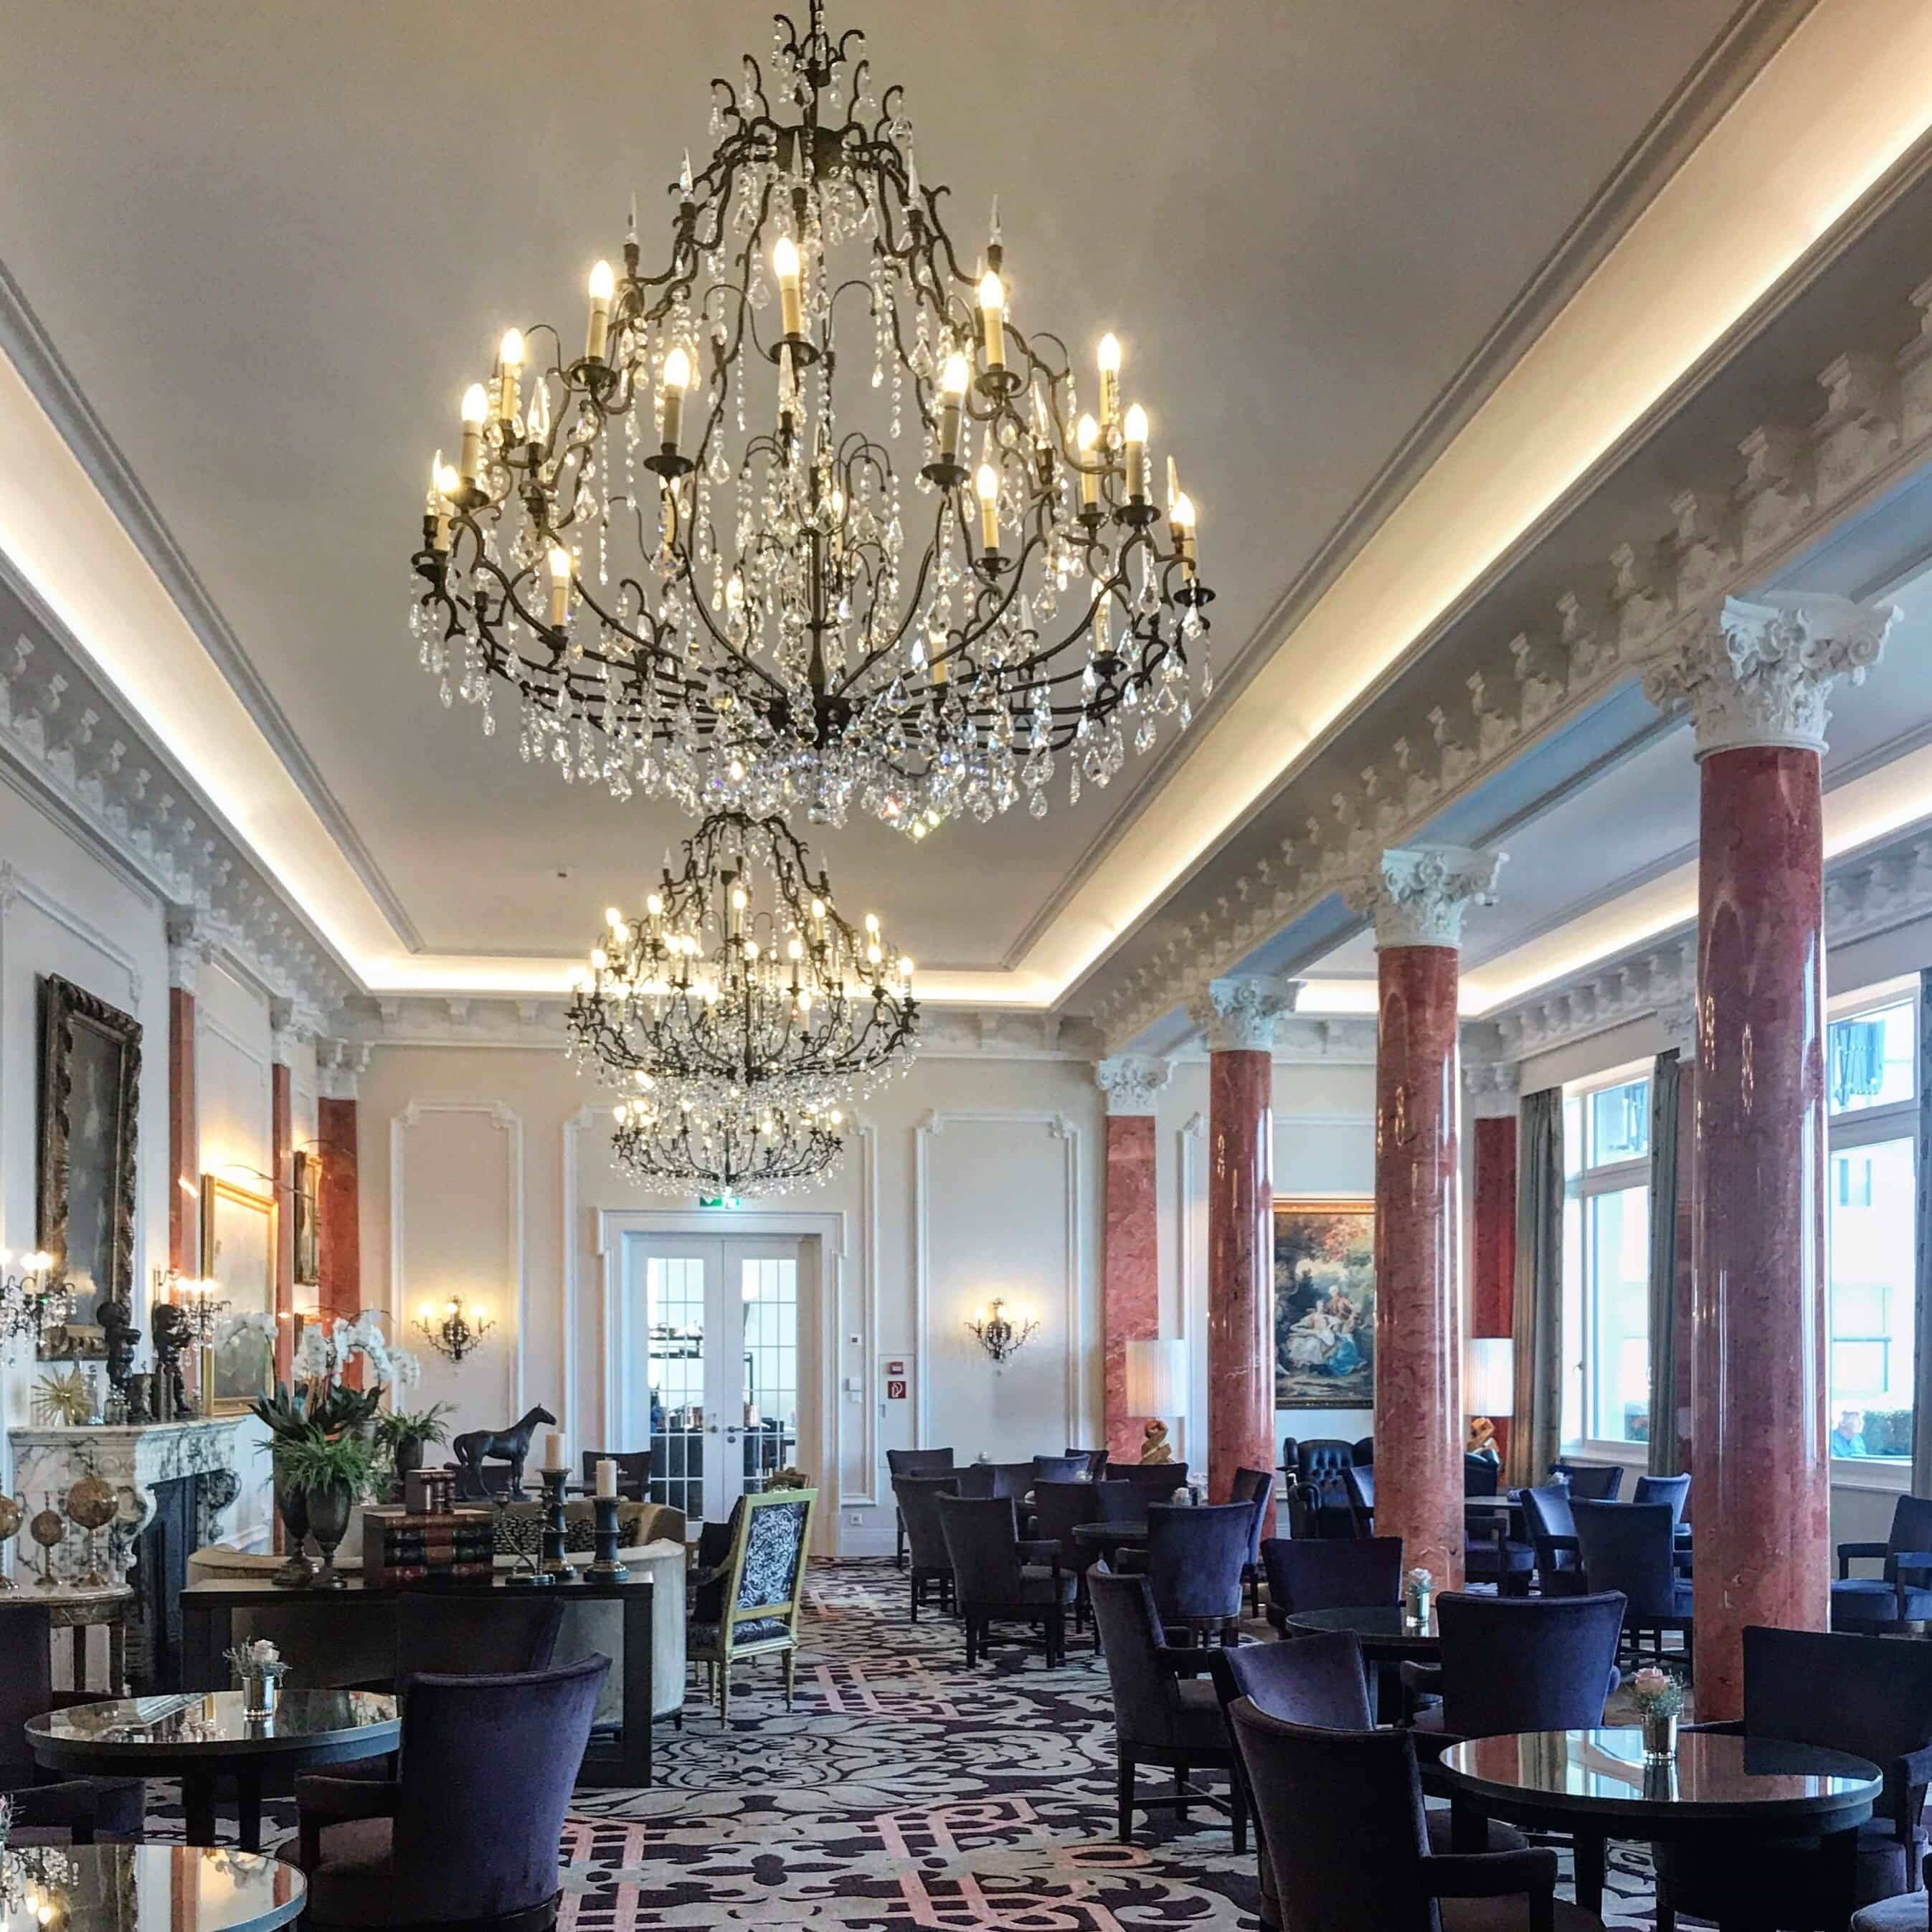 Lounge des Palace Hotels am Bürgenstock